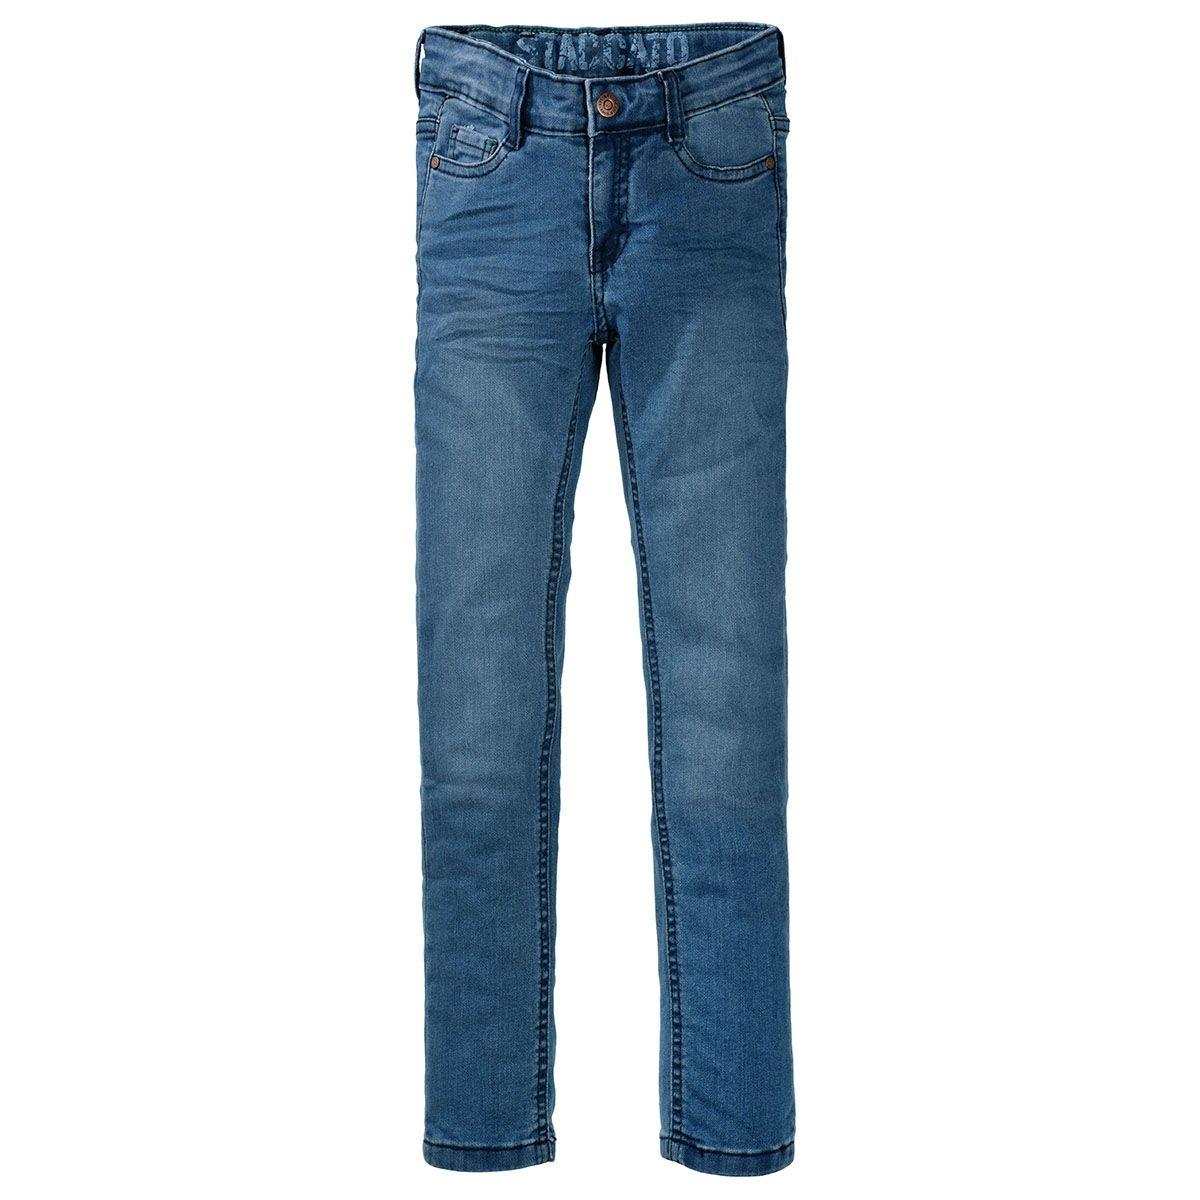 ORGANIC COTTON Skinny Jeans Slim Fit  - Light Blue Denim